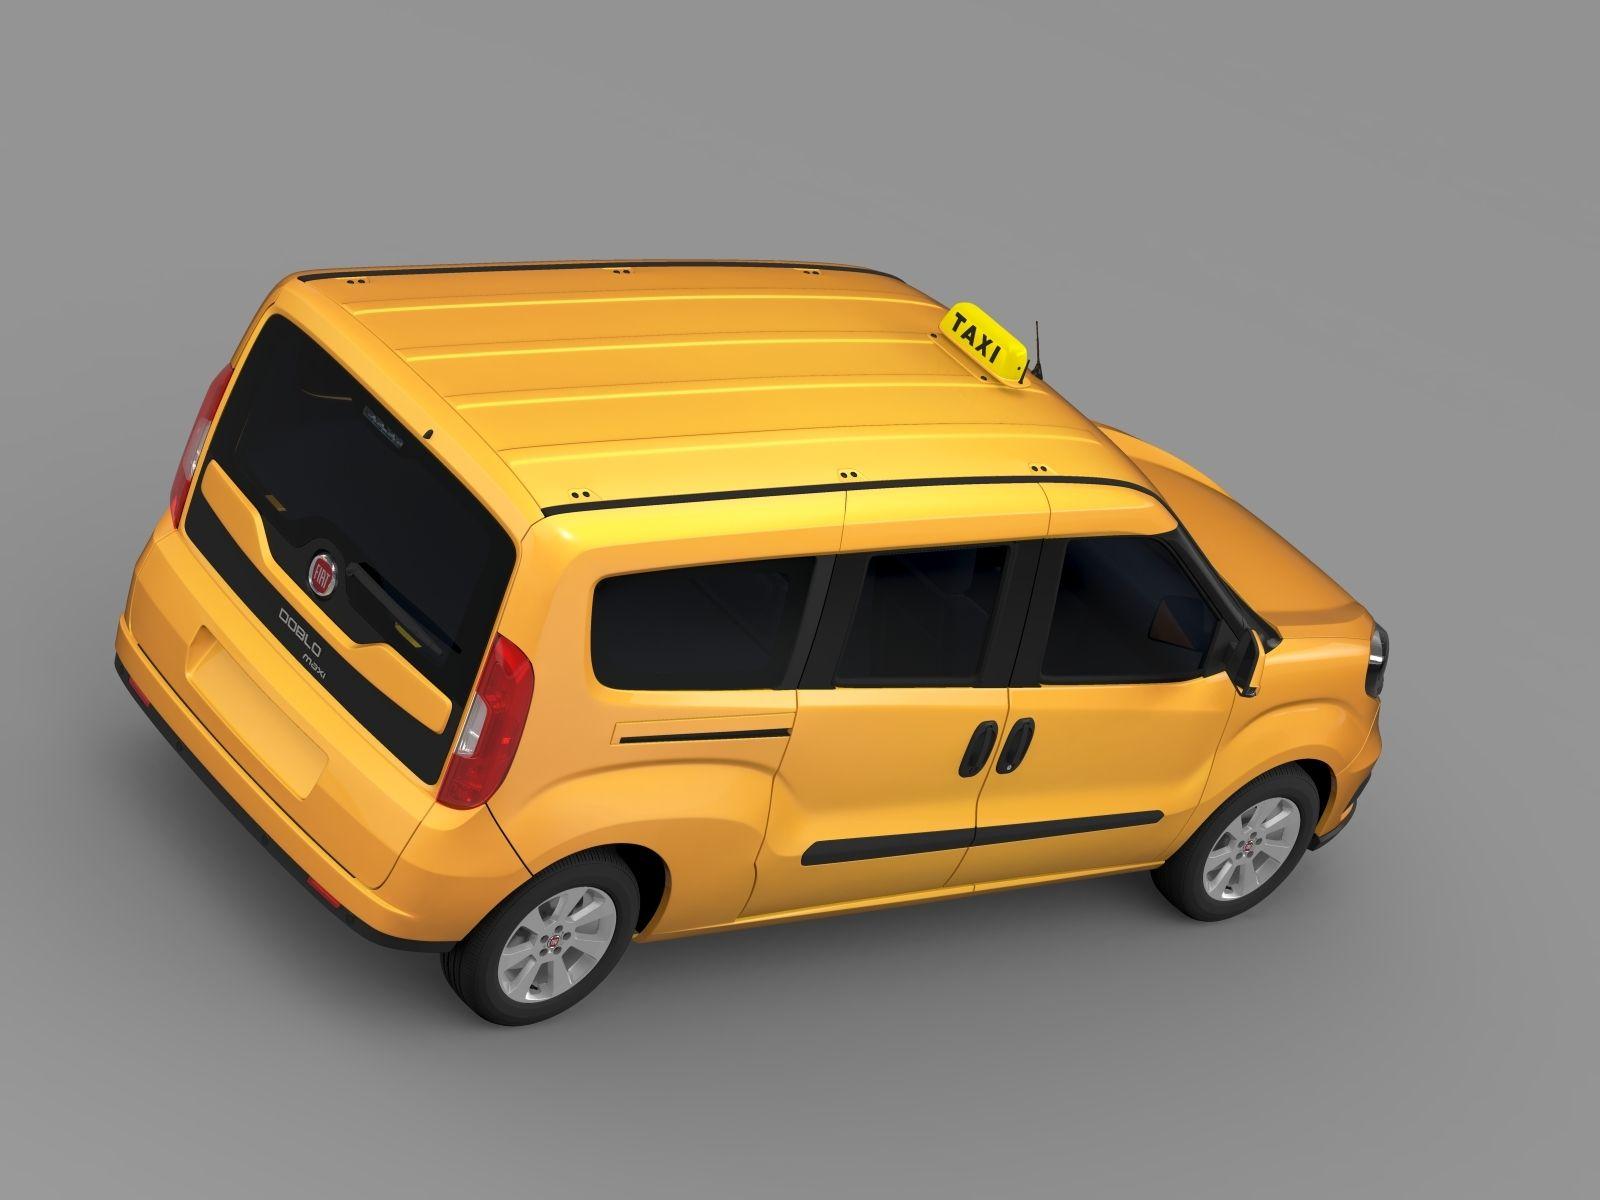 Fiat Doblo Maxi Taxi 152 2015 Fiat Doblo Fiat Taxi